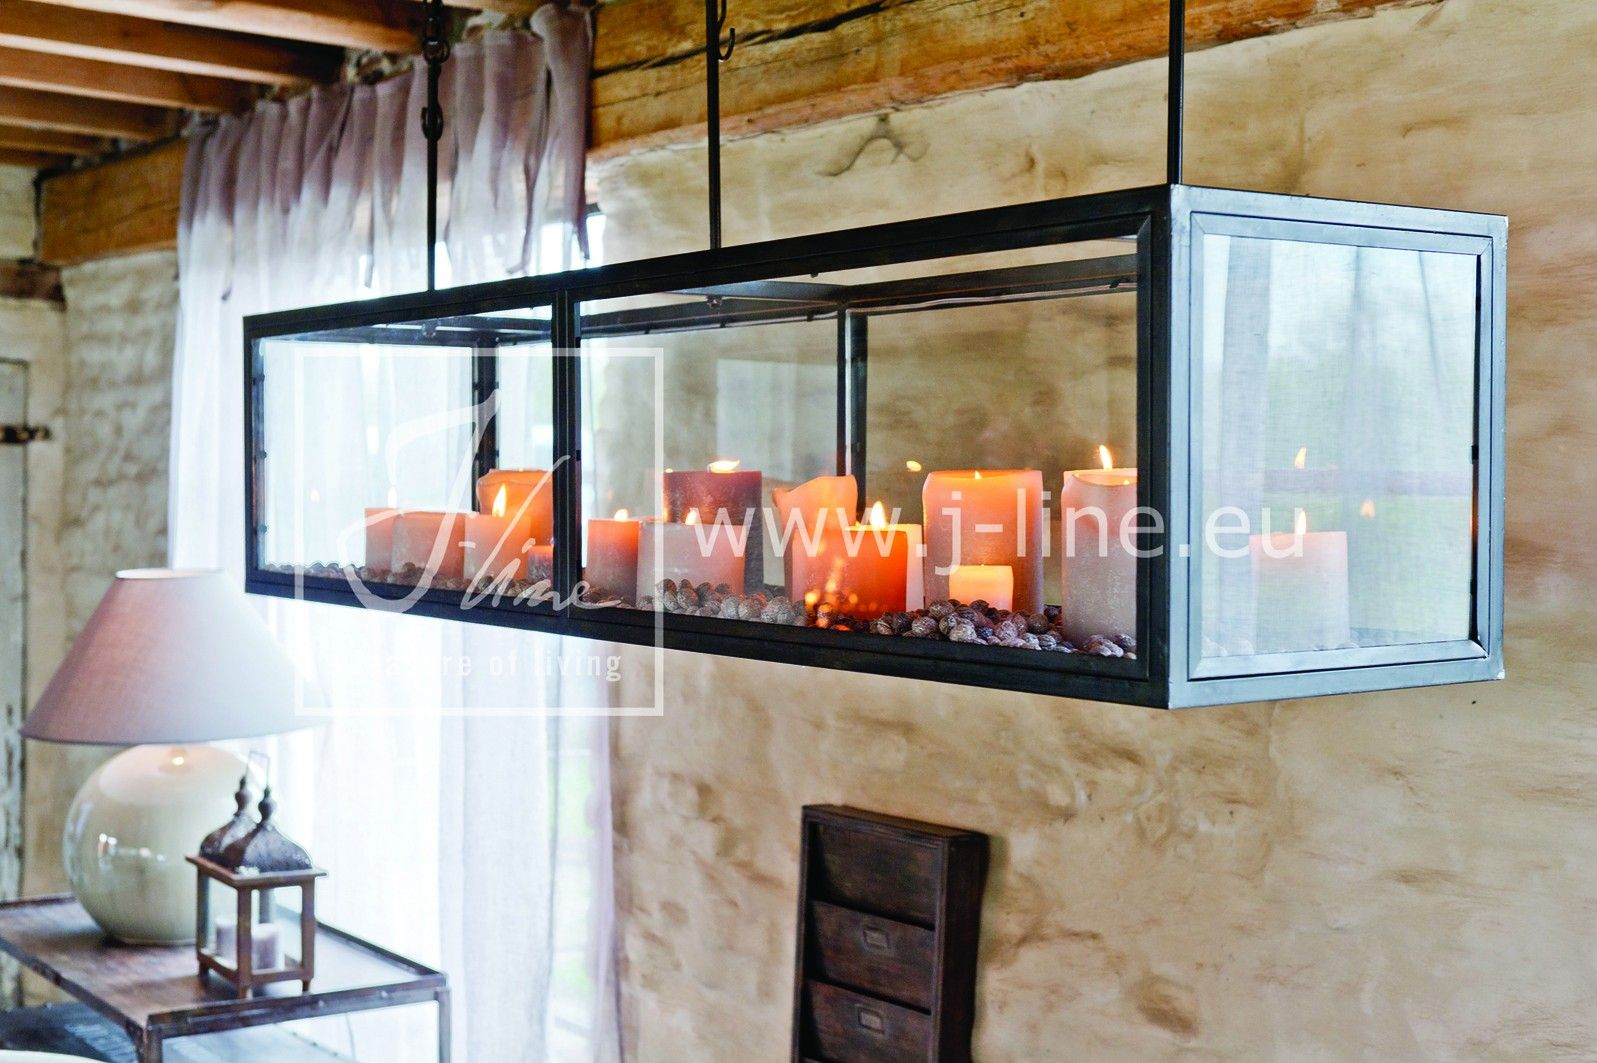 Kaarshouder Als Sfeervolle Verlichting J Line Thuisdecoratie Verlichting Interieur